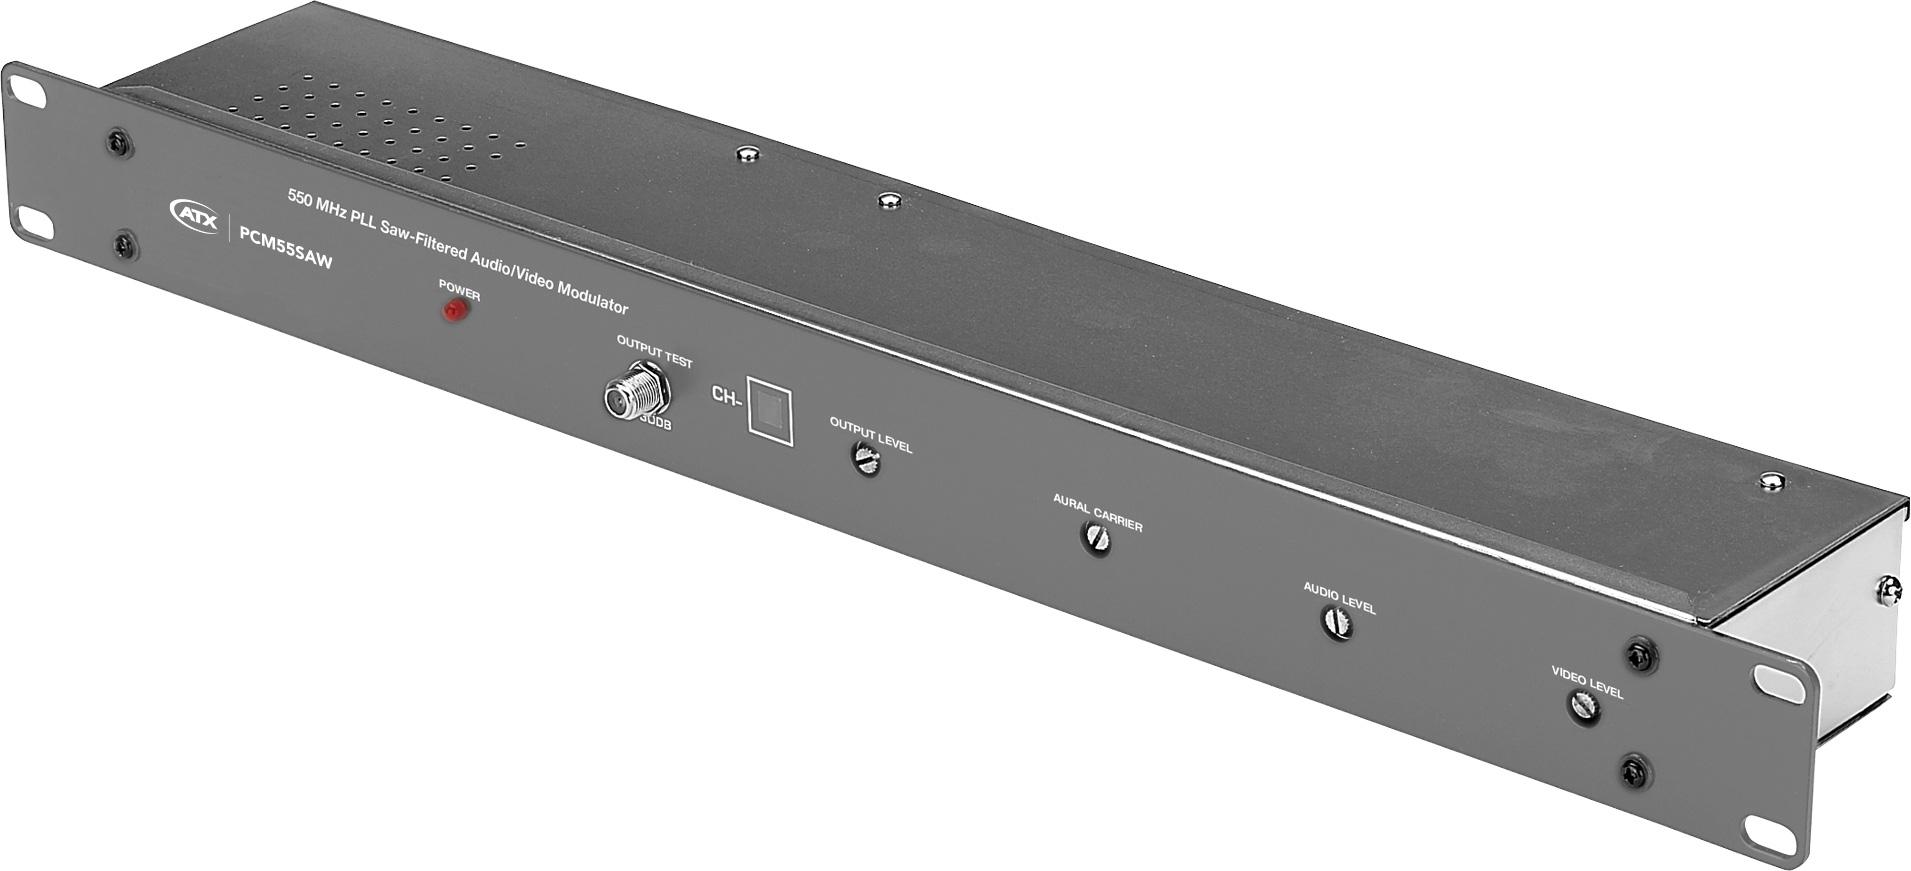 1 Channel Crystal A/V Modulator - Channel 10 PM-PCM55SAW-10